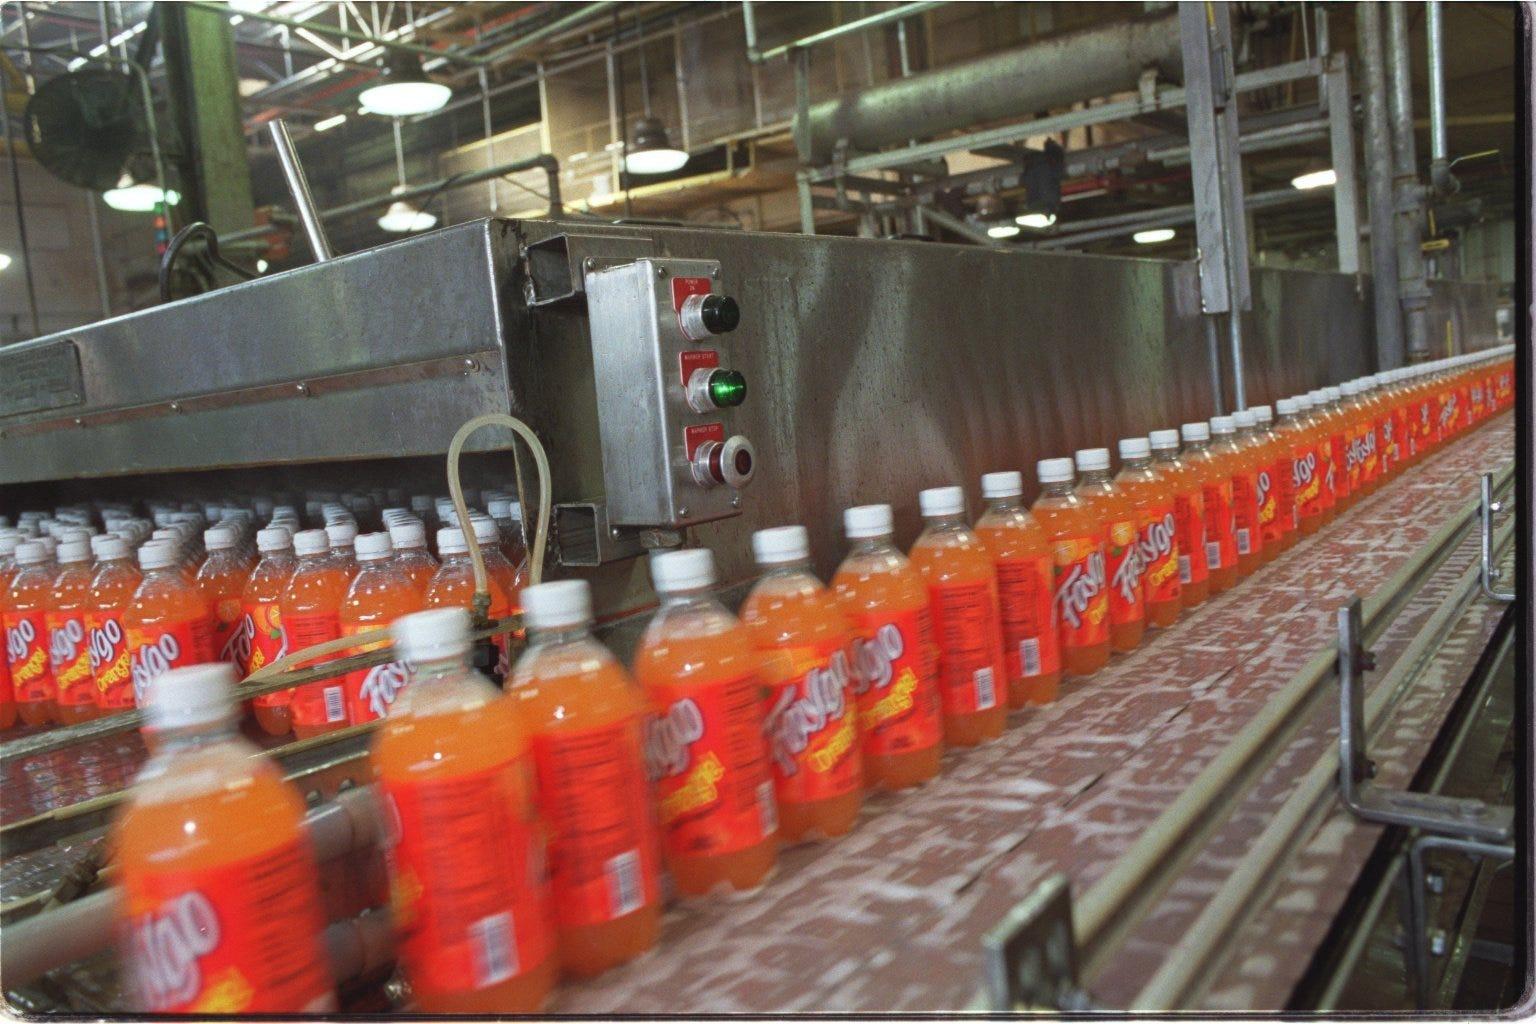 Quality Soda Strawberry Soda Bottle Label Oakland Ca